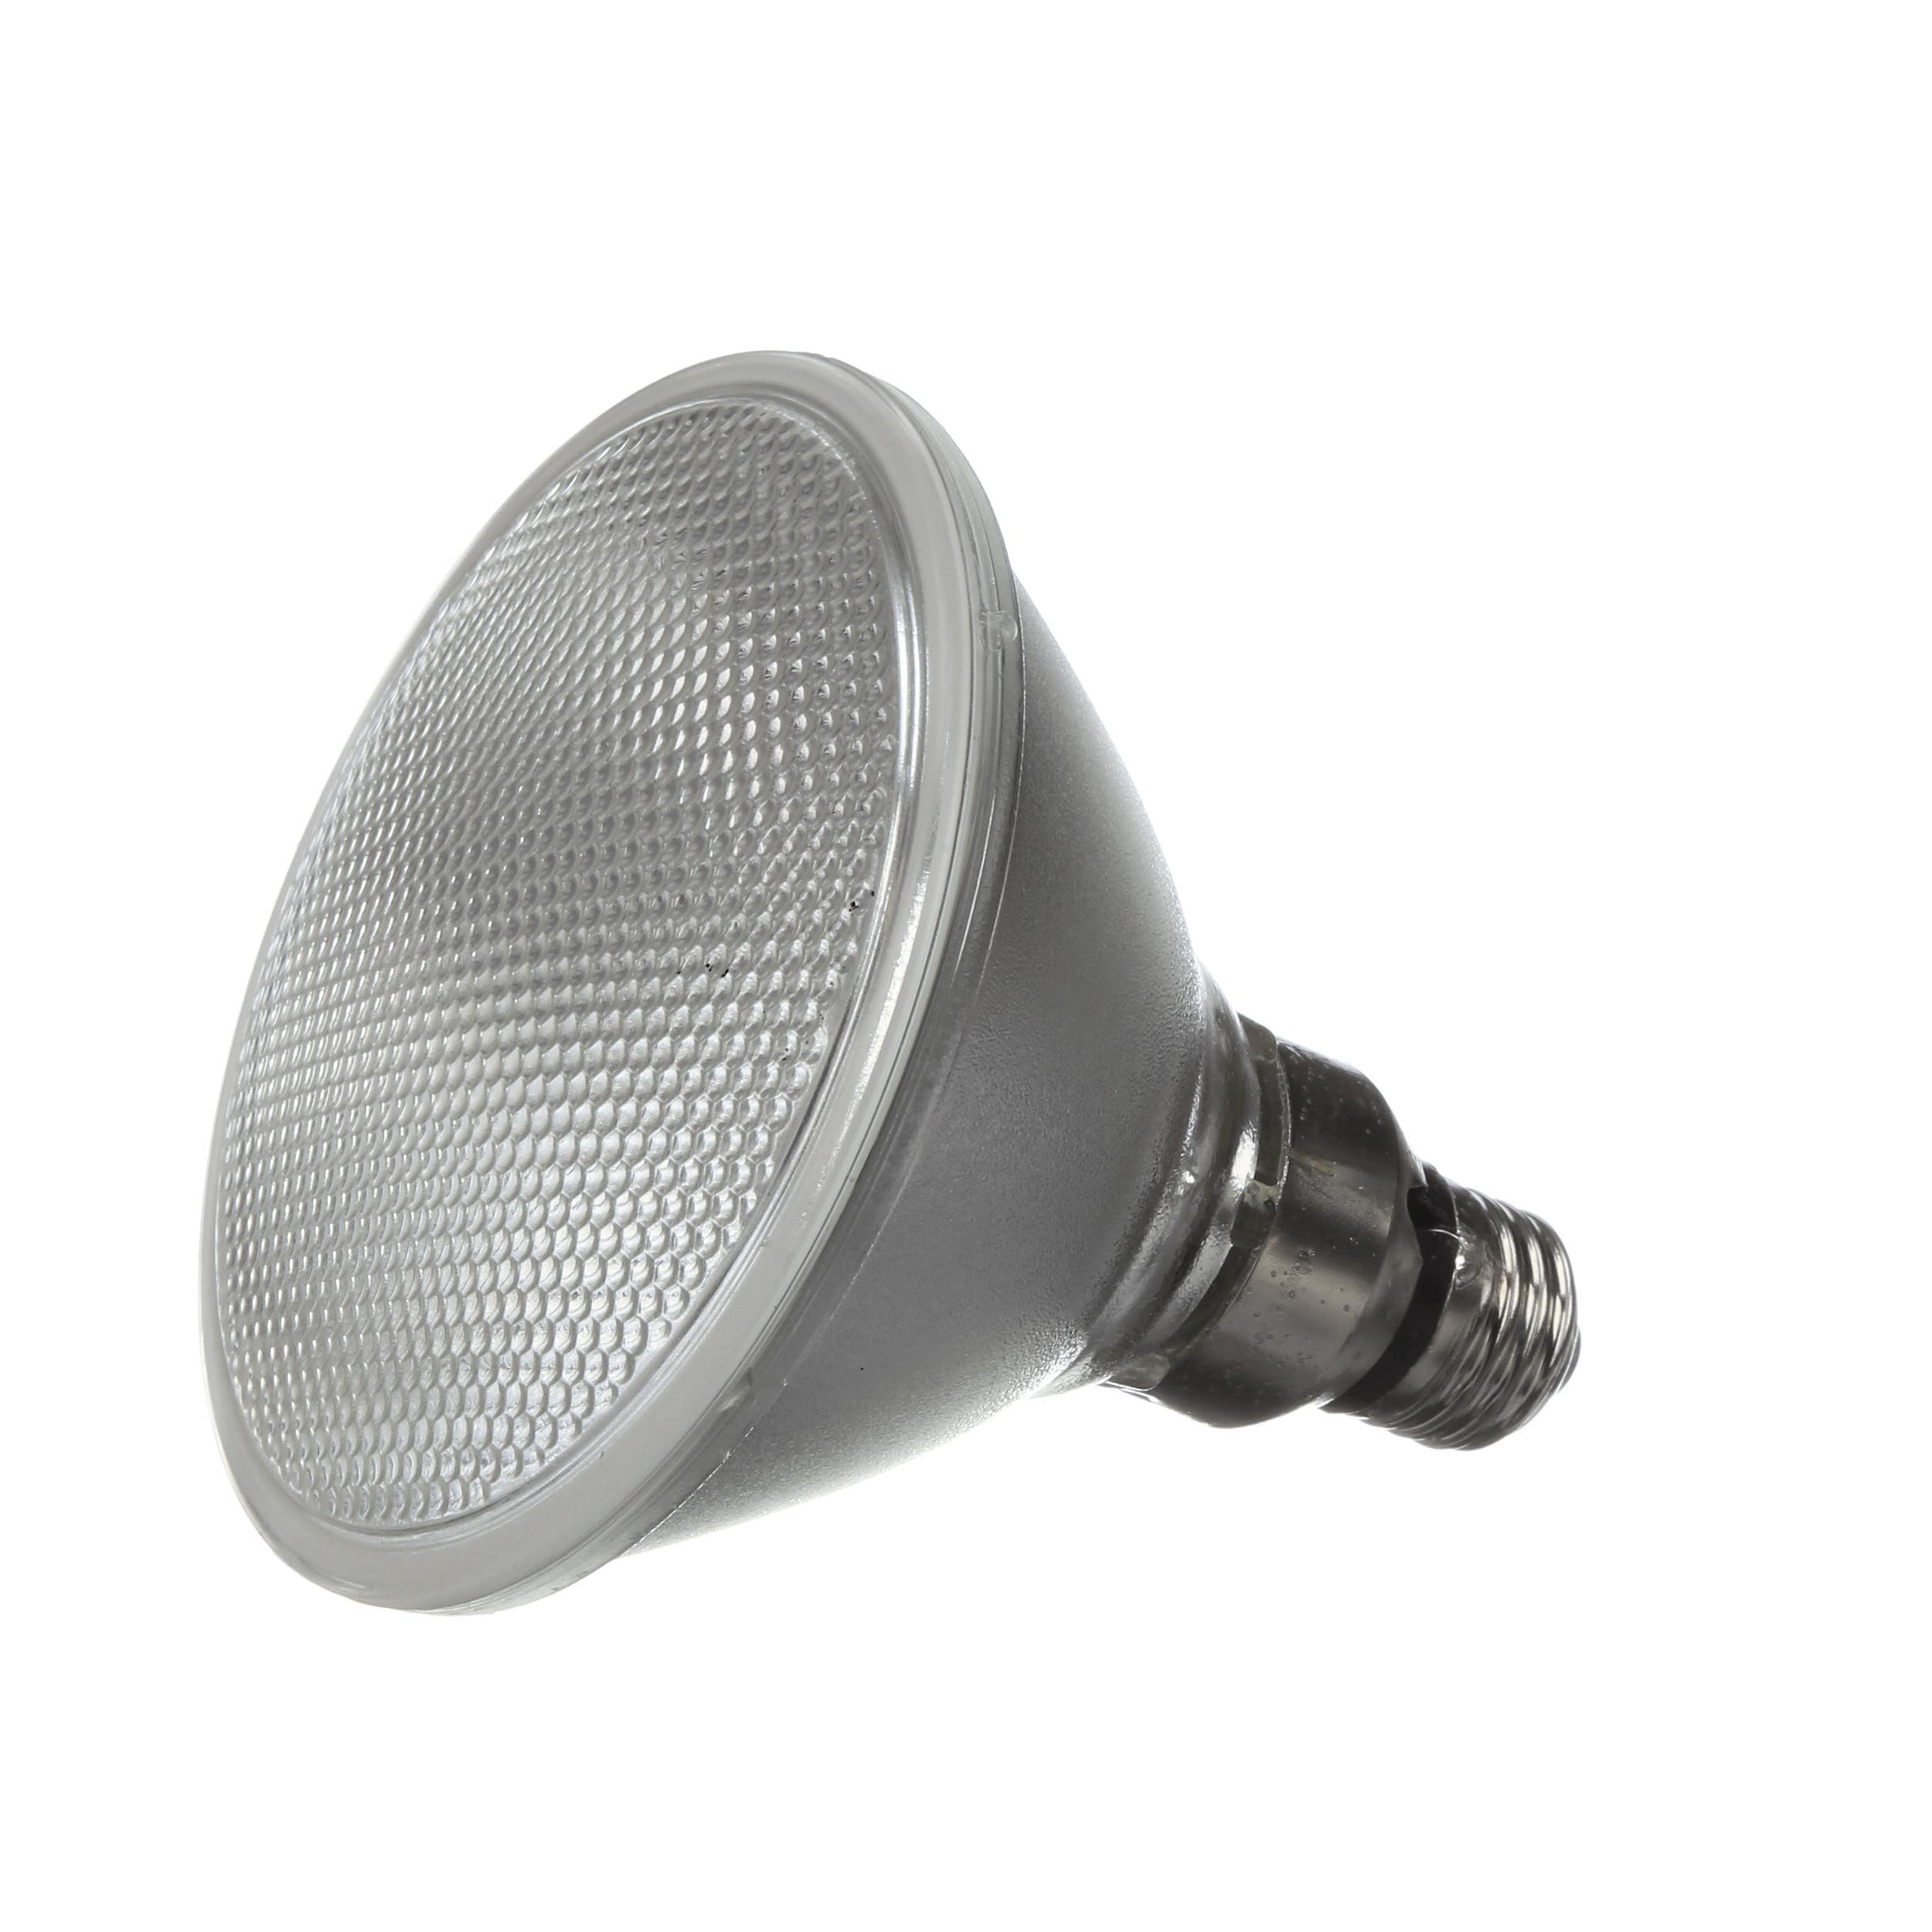 ALTO-SHAAM LAMP,FLOOD,90W,120V,TUFFSKINH